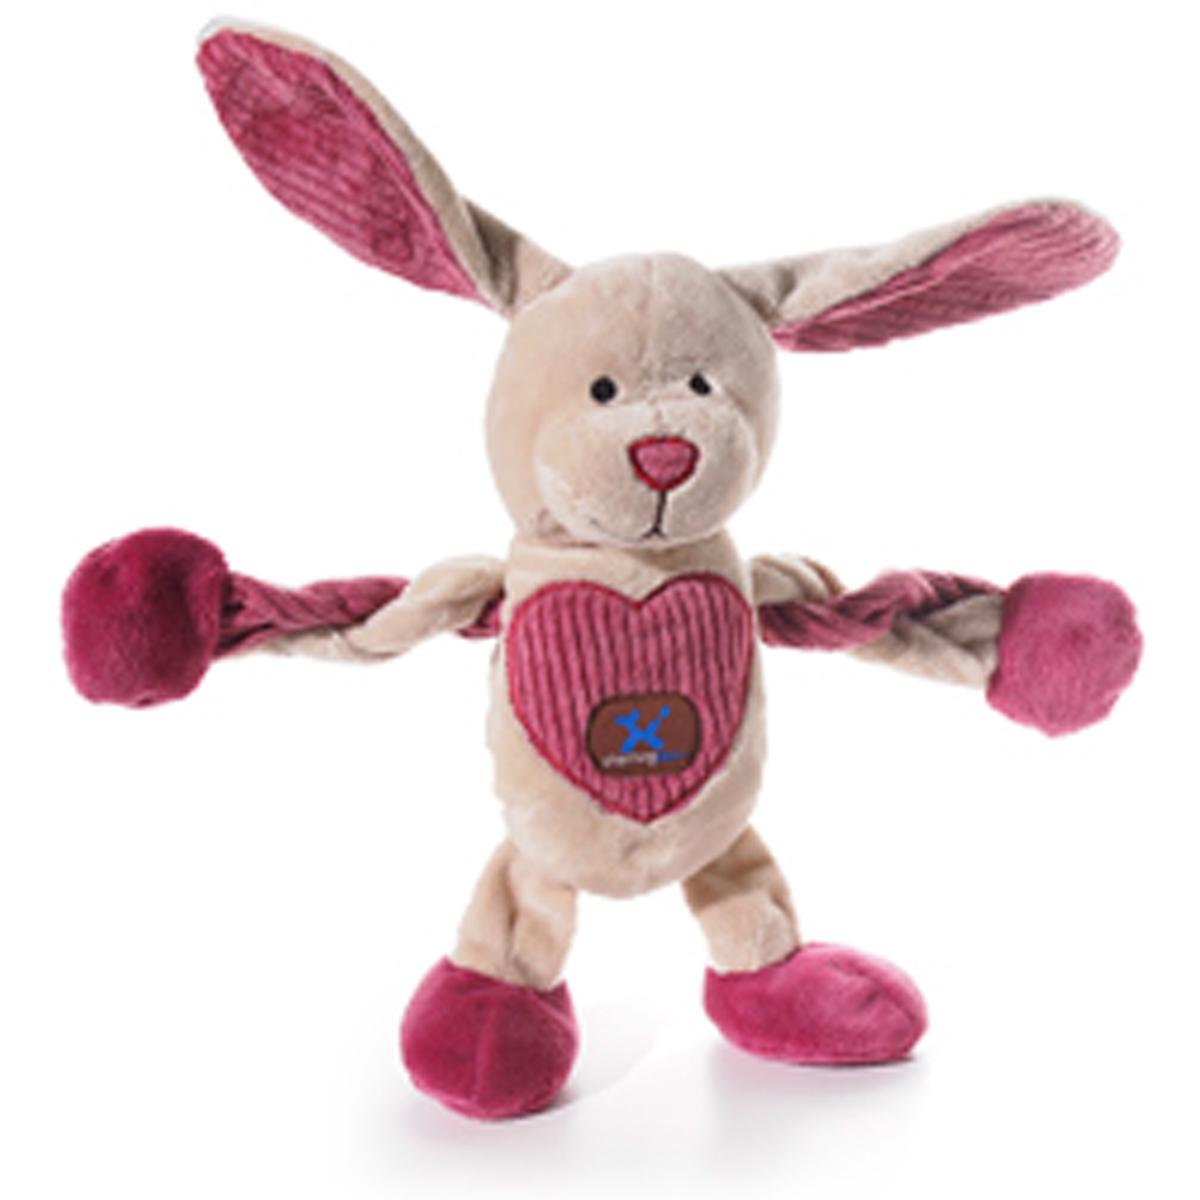 Be-Mine Bunny Pulleez Dog Toy